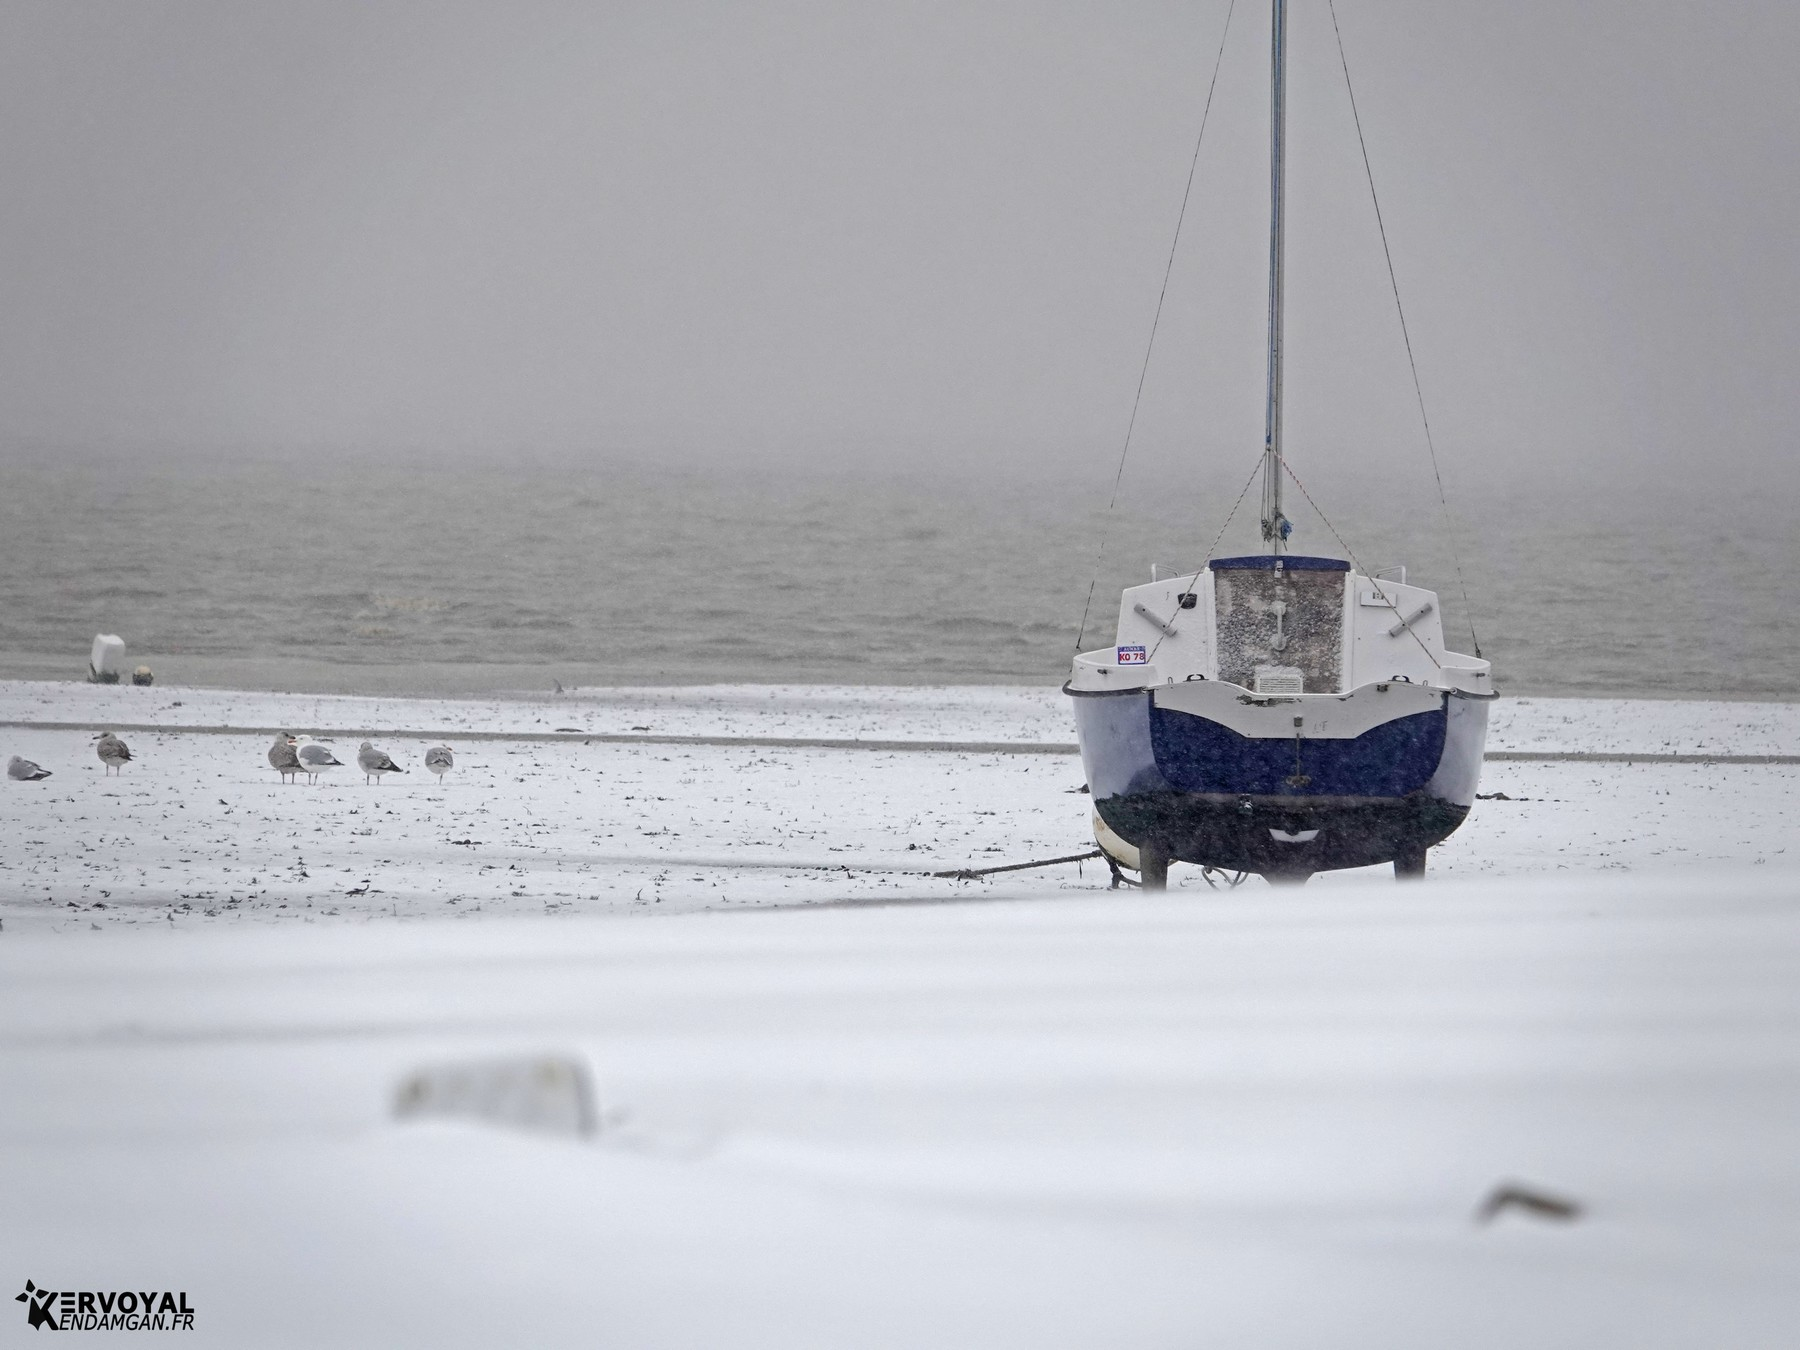 neige à kervoyal 11 février 2021 damgan morbihan (38)